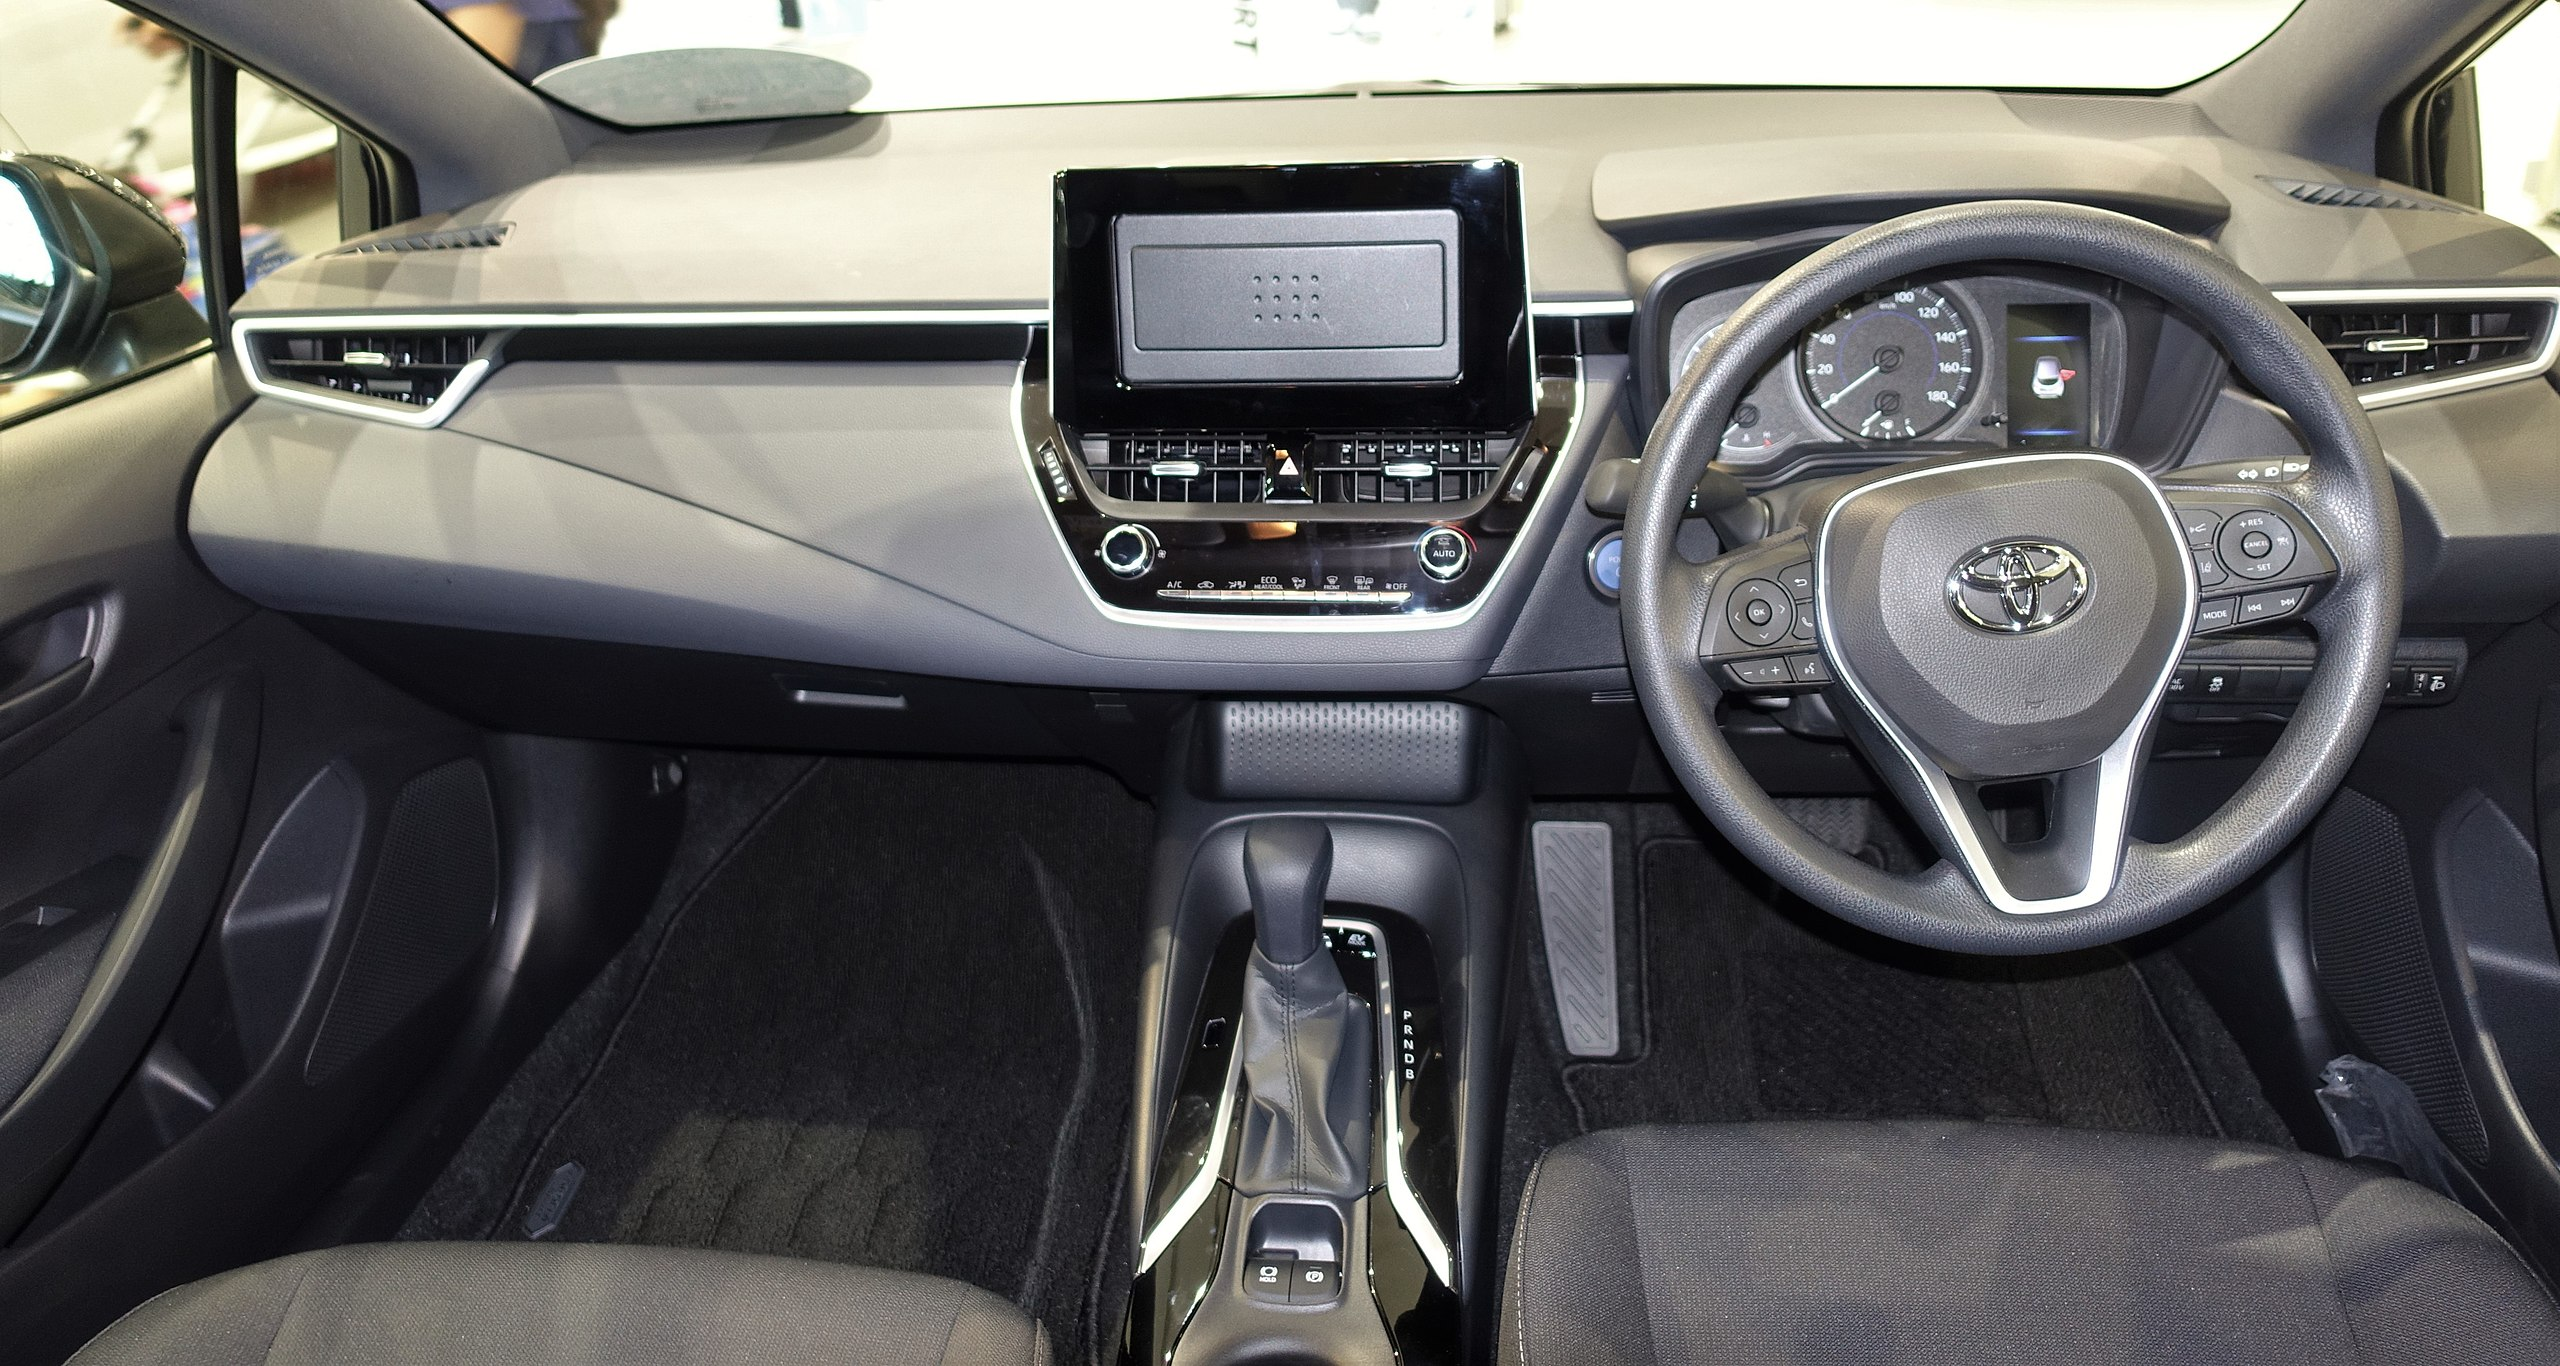 Toyota Corolla Sport interior.jpg